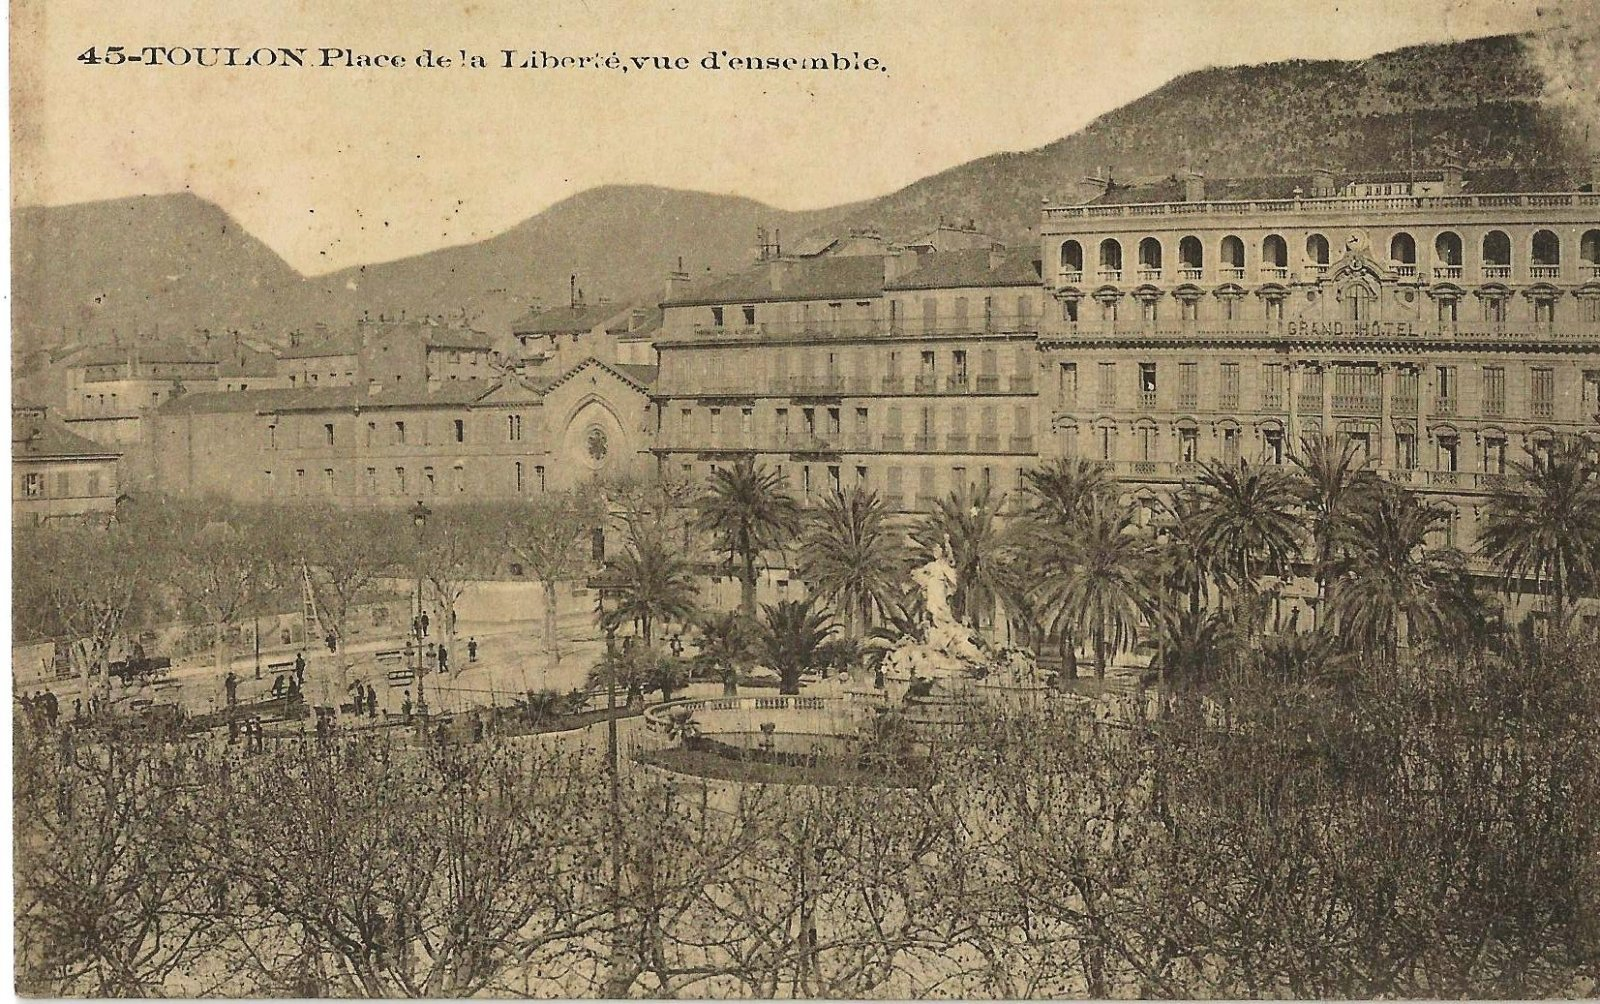 TOULON PLCE DE LIBERTE 1907